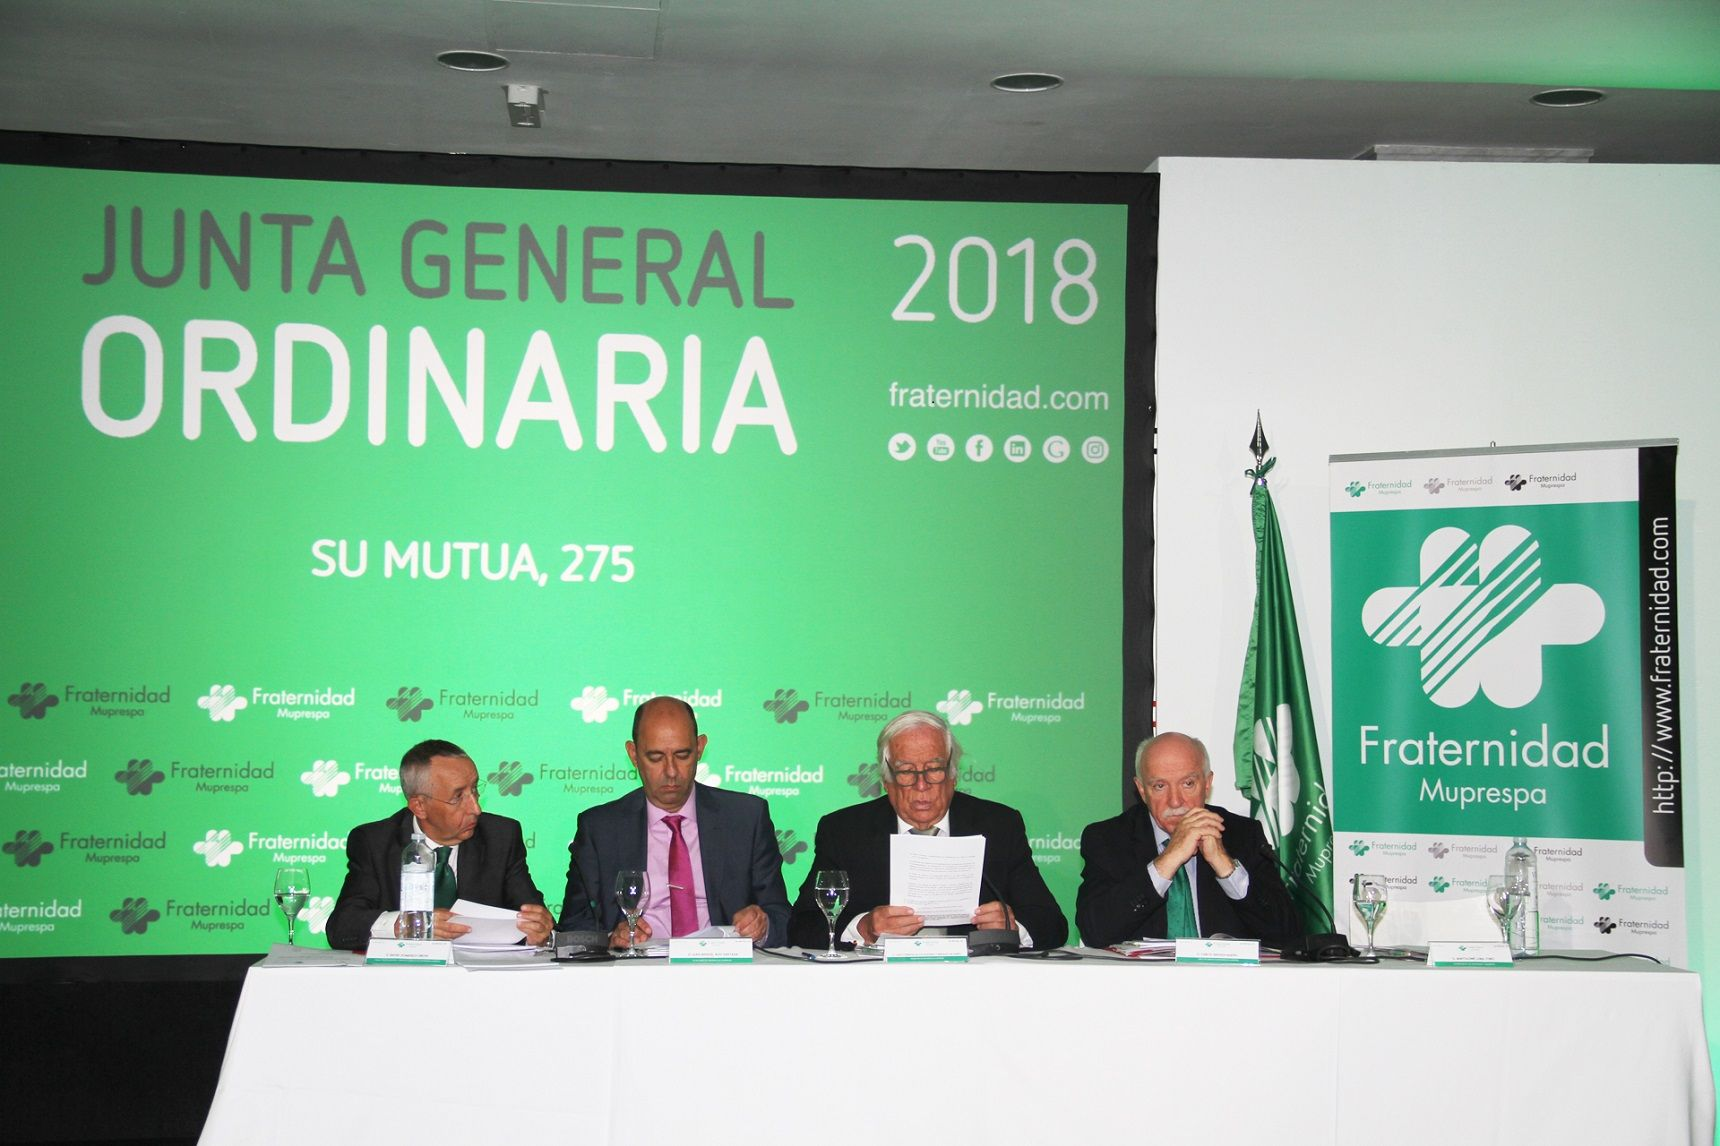 Foto de Junta General Ordinaria de Fraternidad-Muprespa